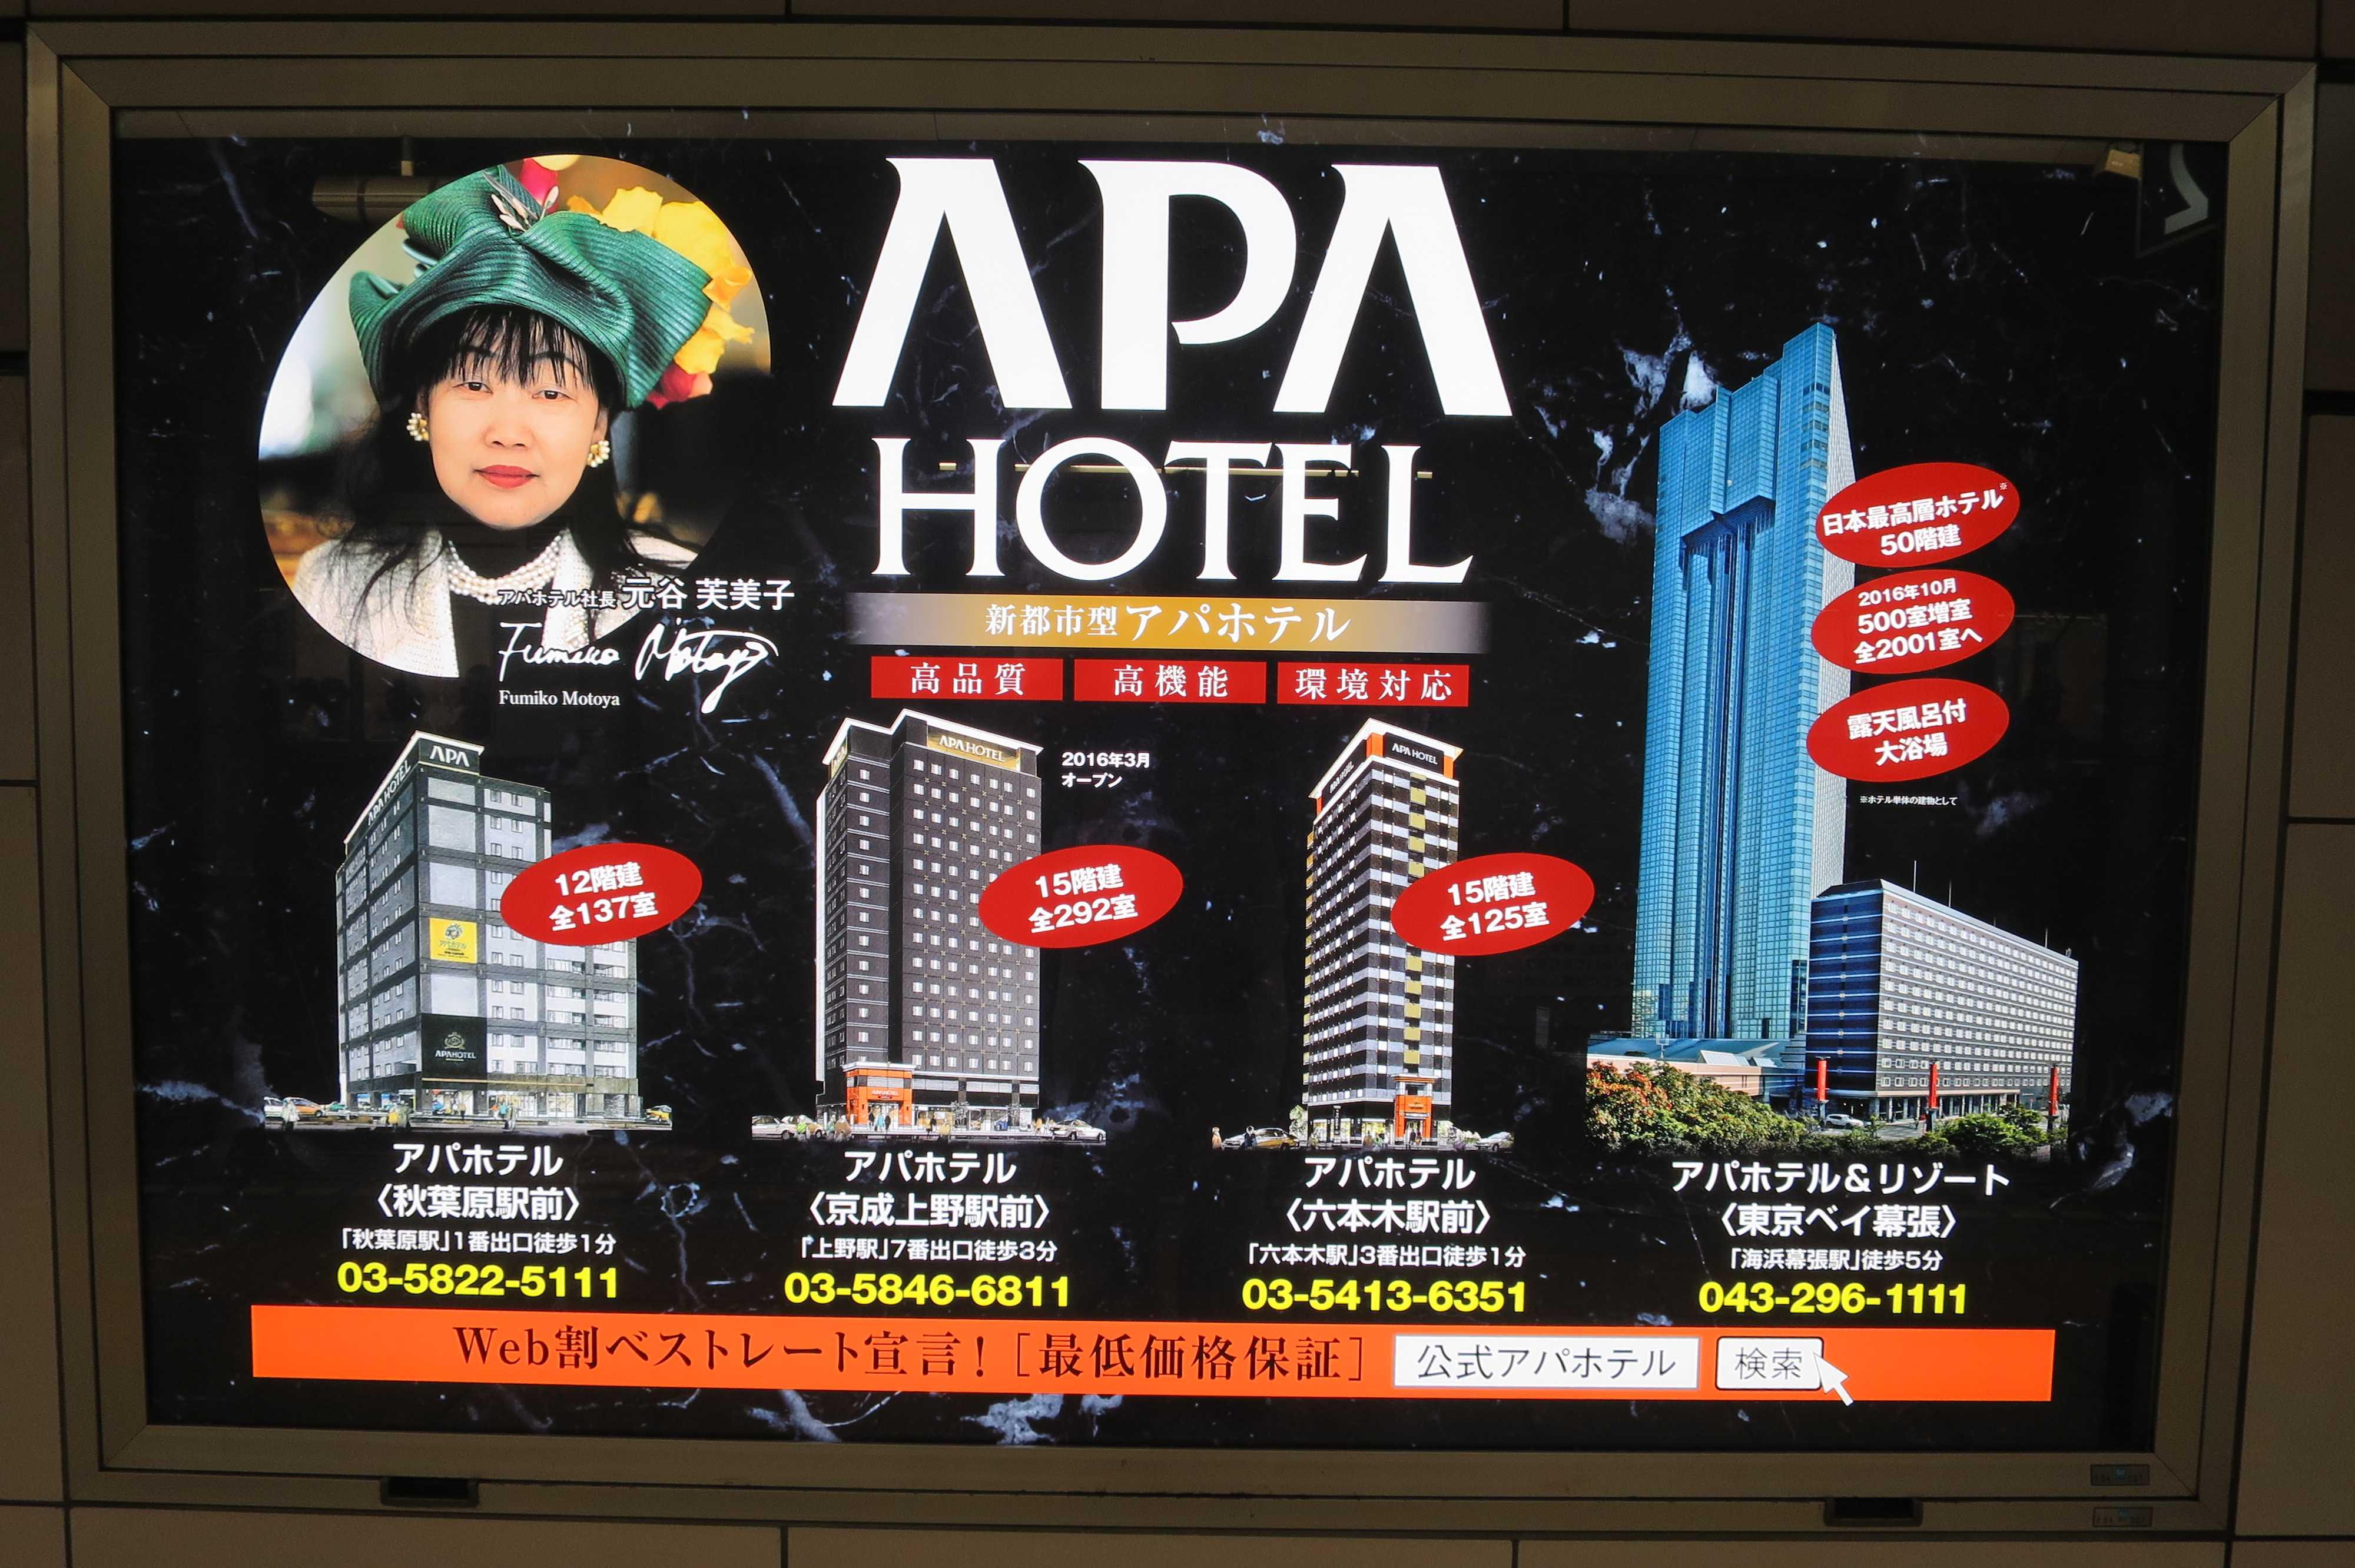 APA HOTEL(アパホテル)の電飾看板